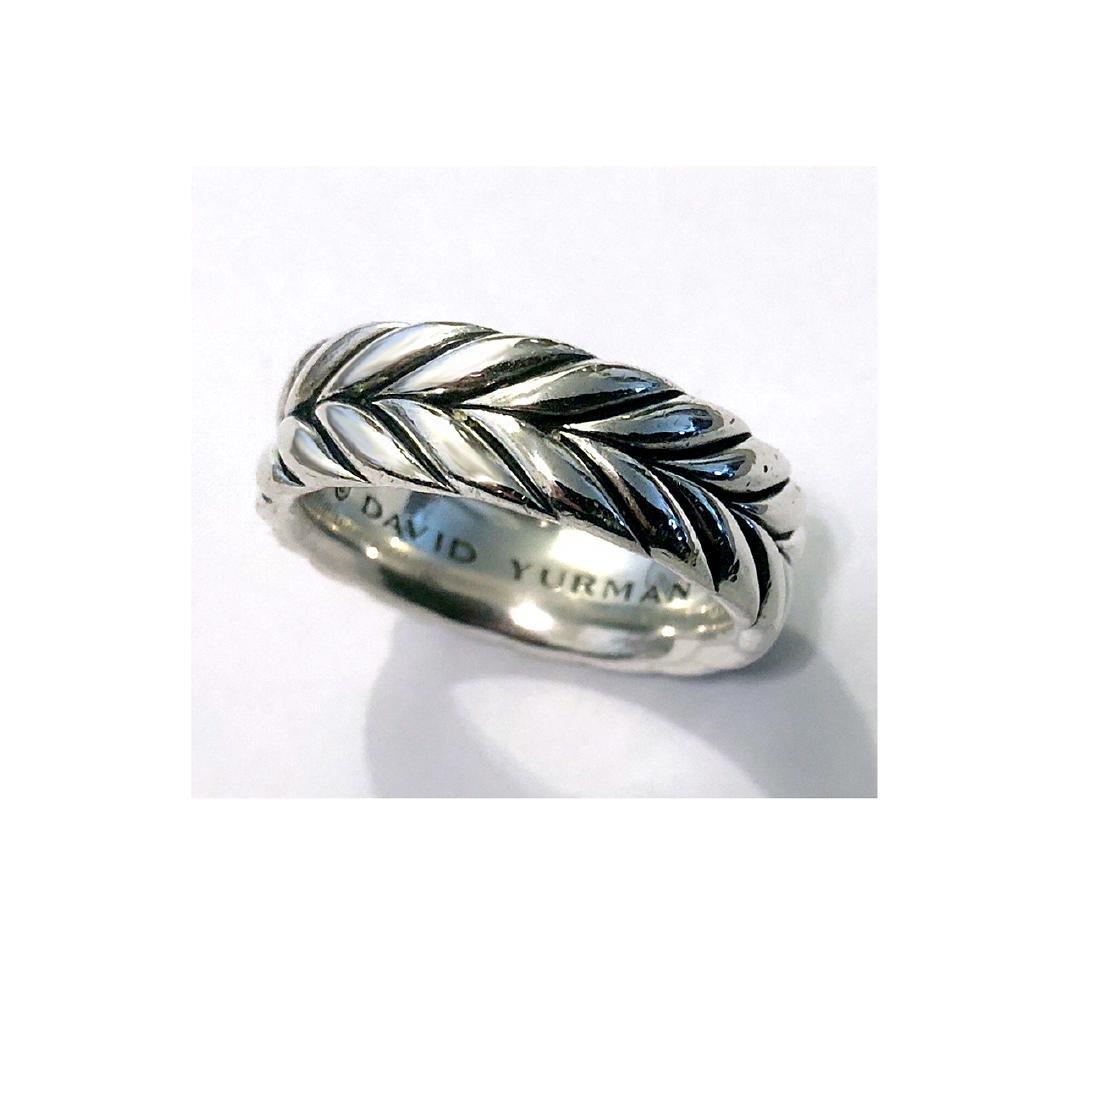 David Yurman Sterling Silver Chevron Men's Ring sz 12 - 3